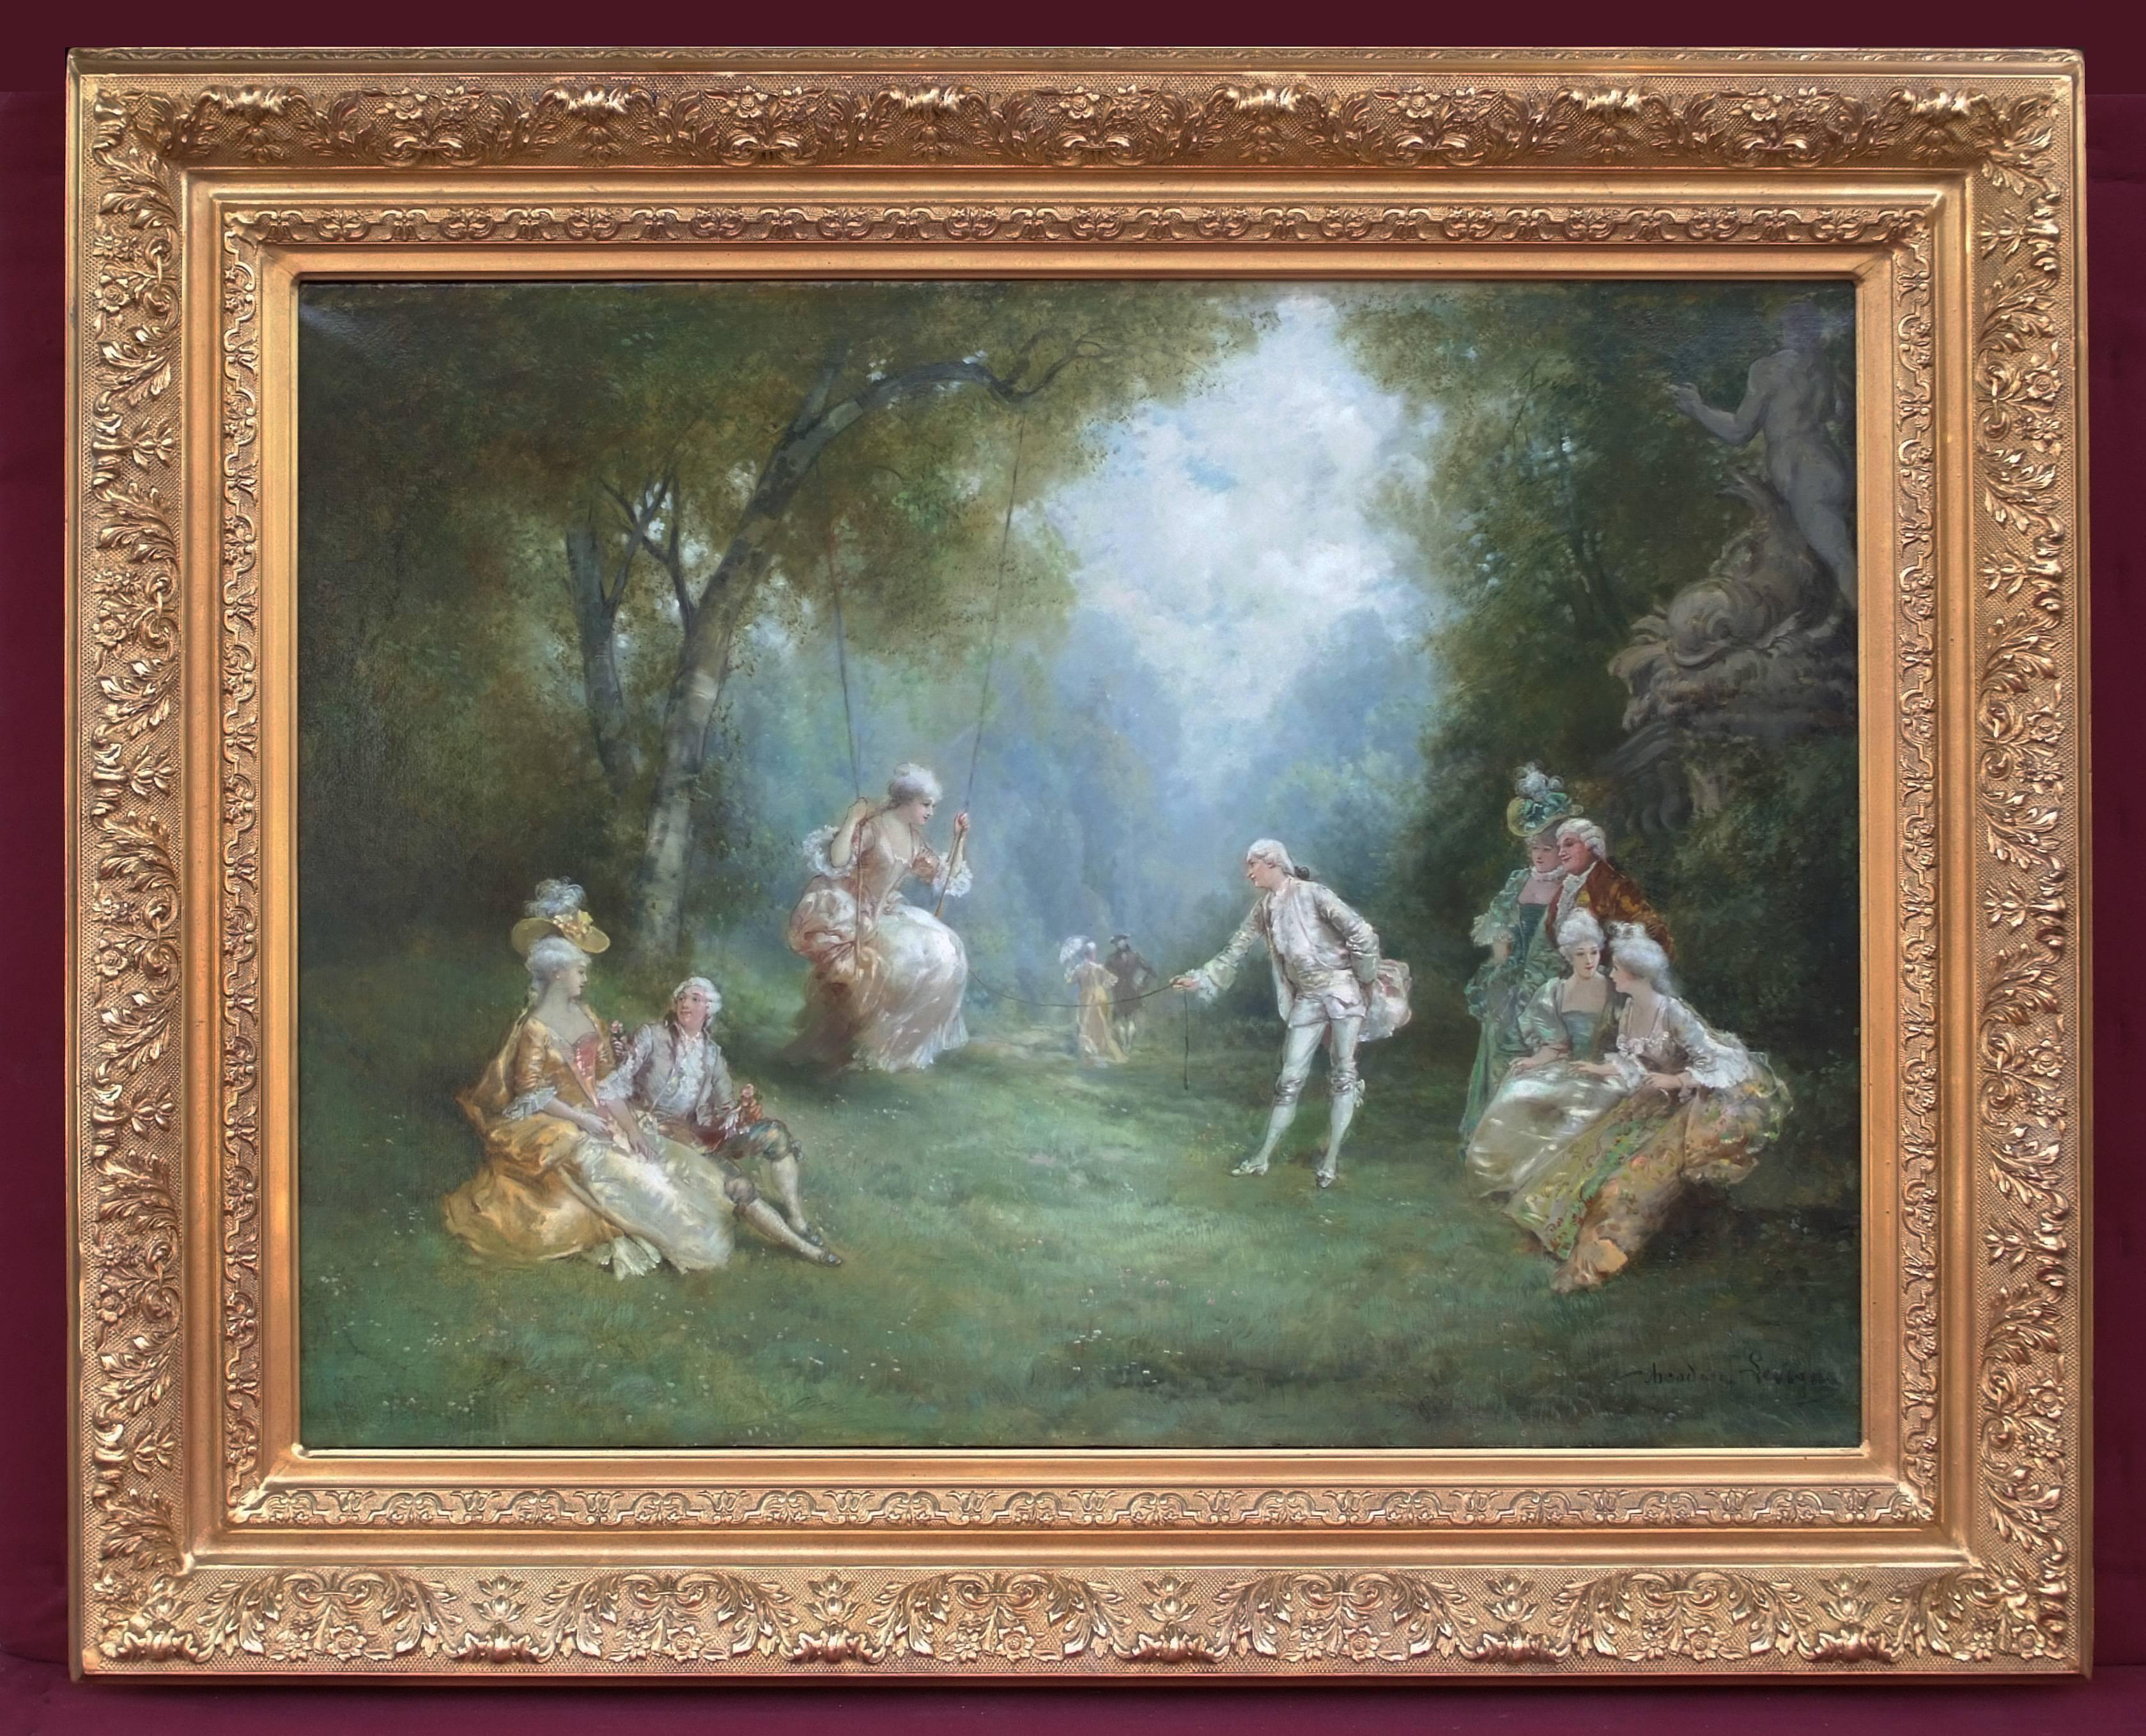 Oil Painting Genre Scene 18th Century